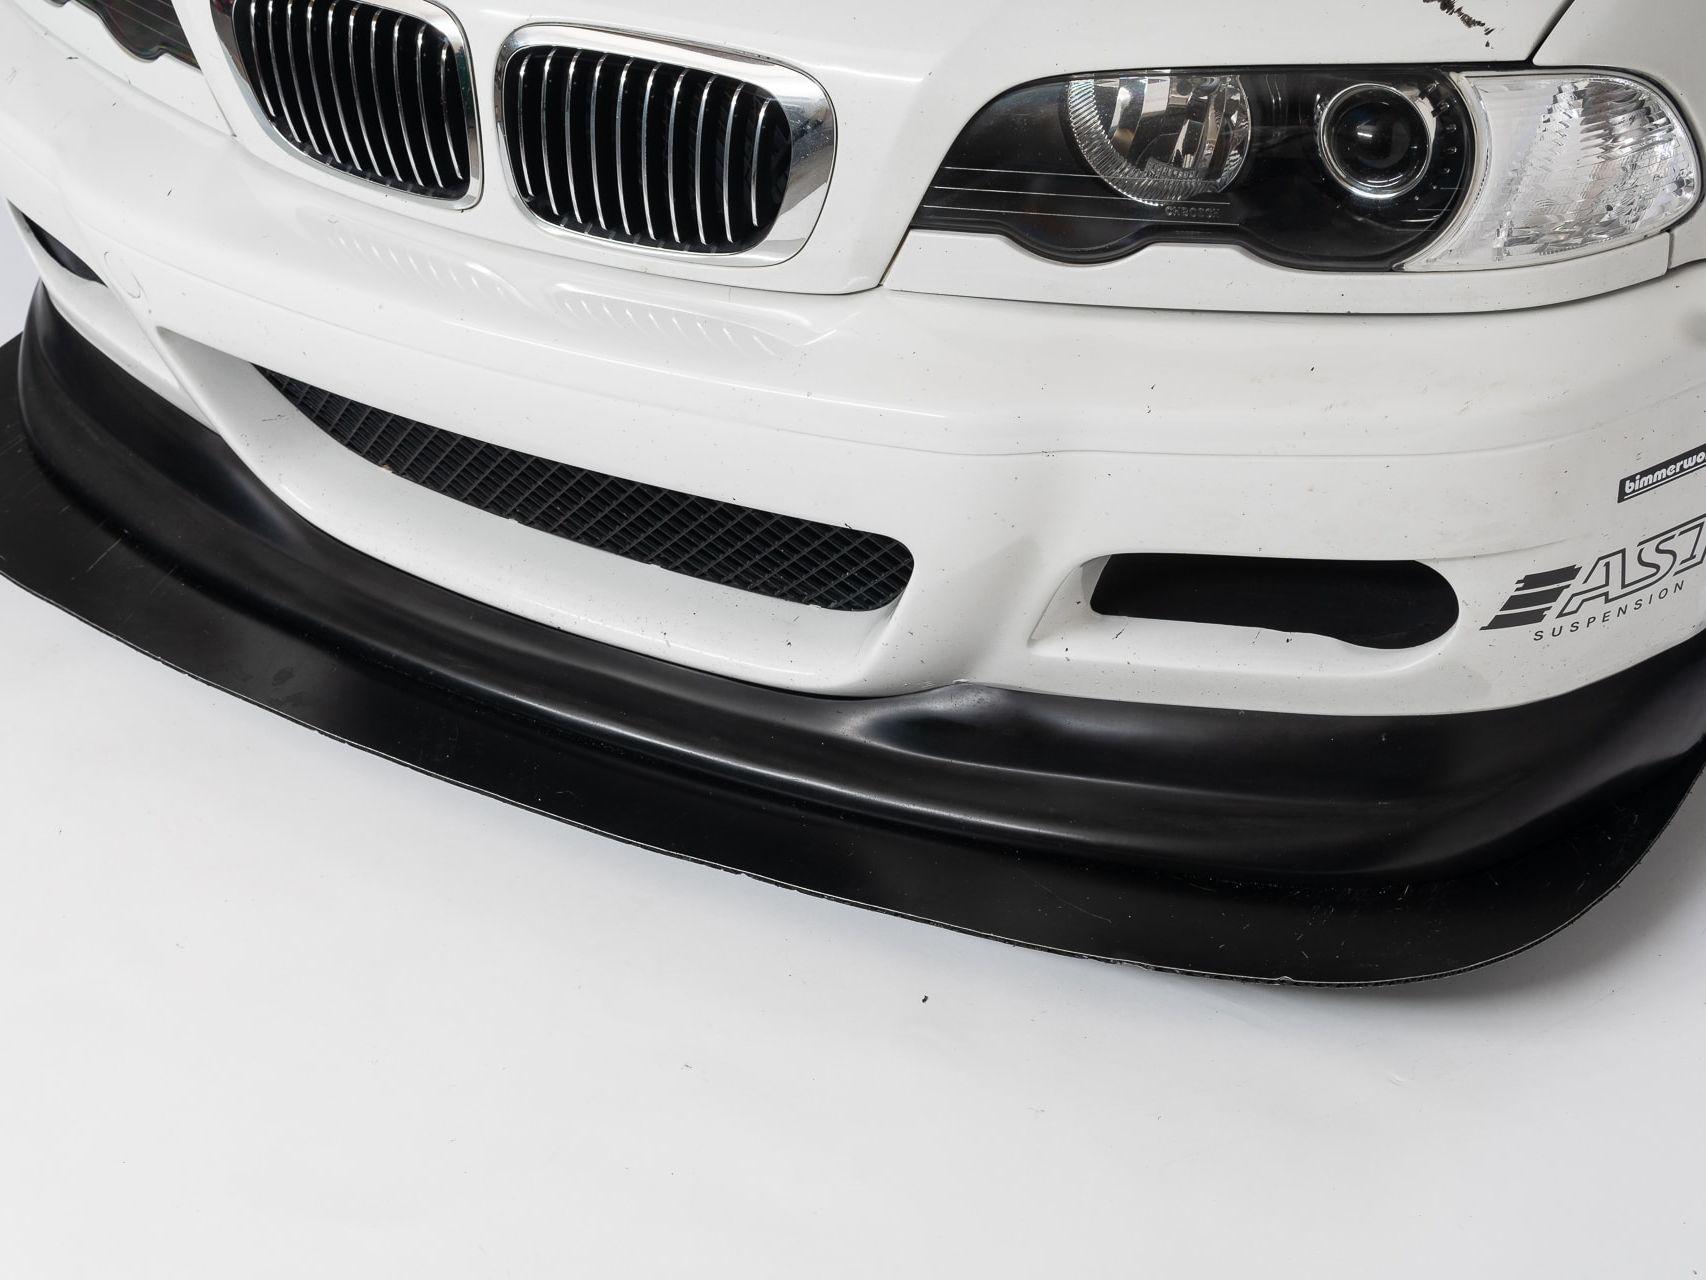 E46 M3 Quick Release Front Splitter Bracket